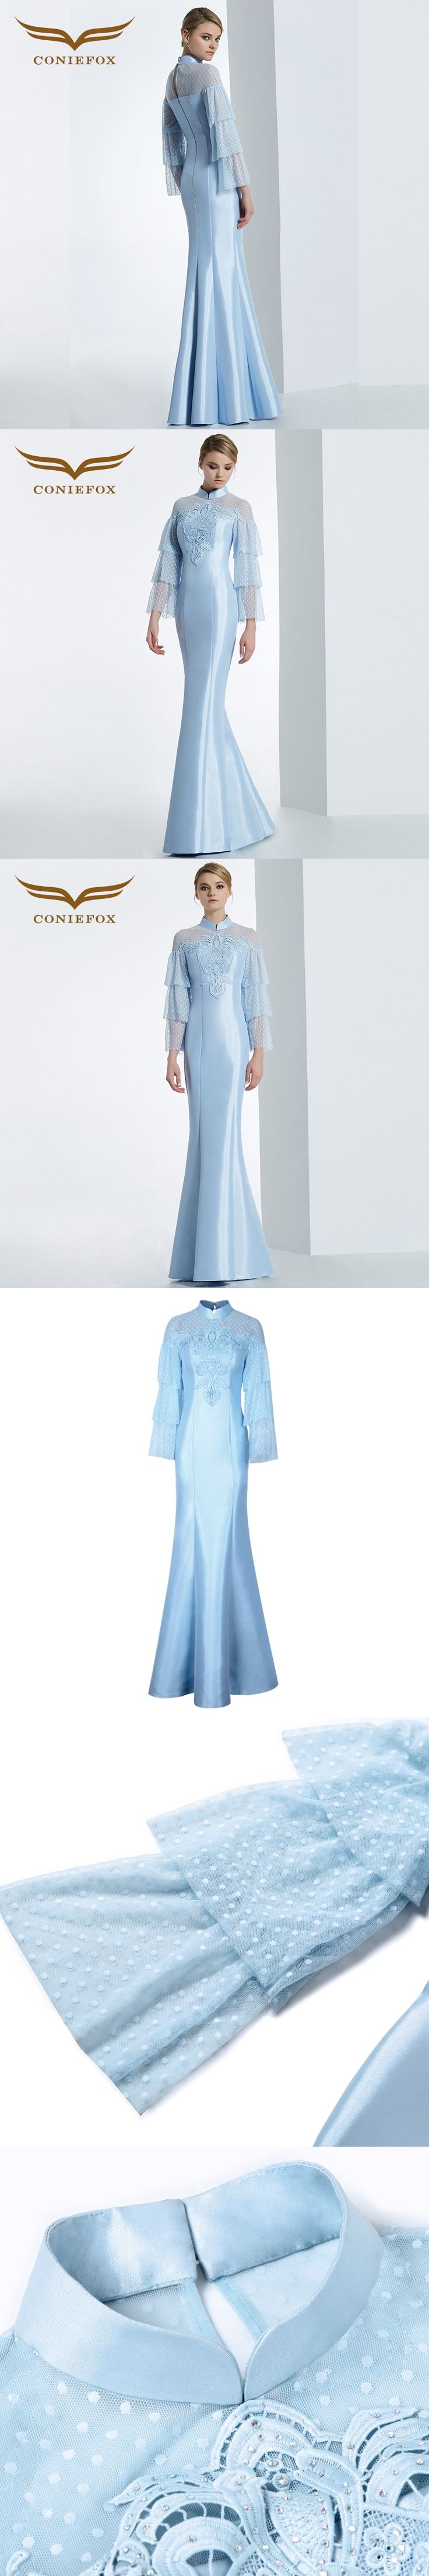 CONIEFOX 31621 blue Mermaid Luxury Lace prom dresses Ladies evening party dress gown Xmas dress robe de soiree 2016 NEW